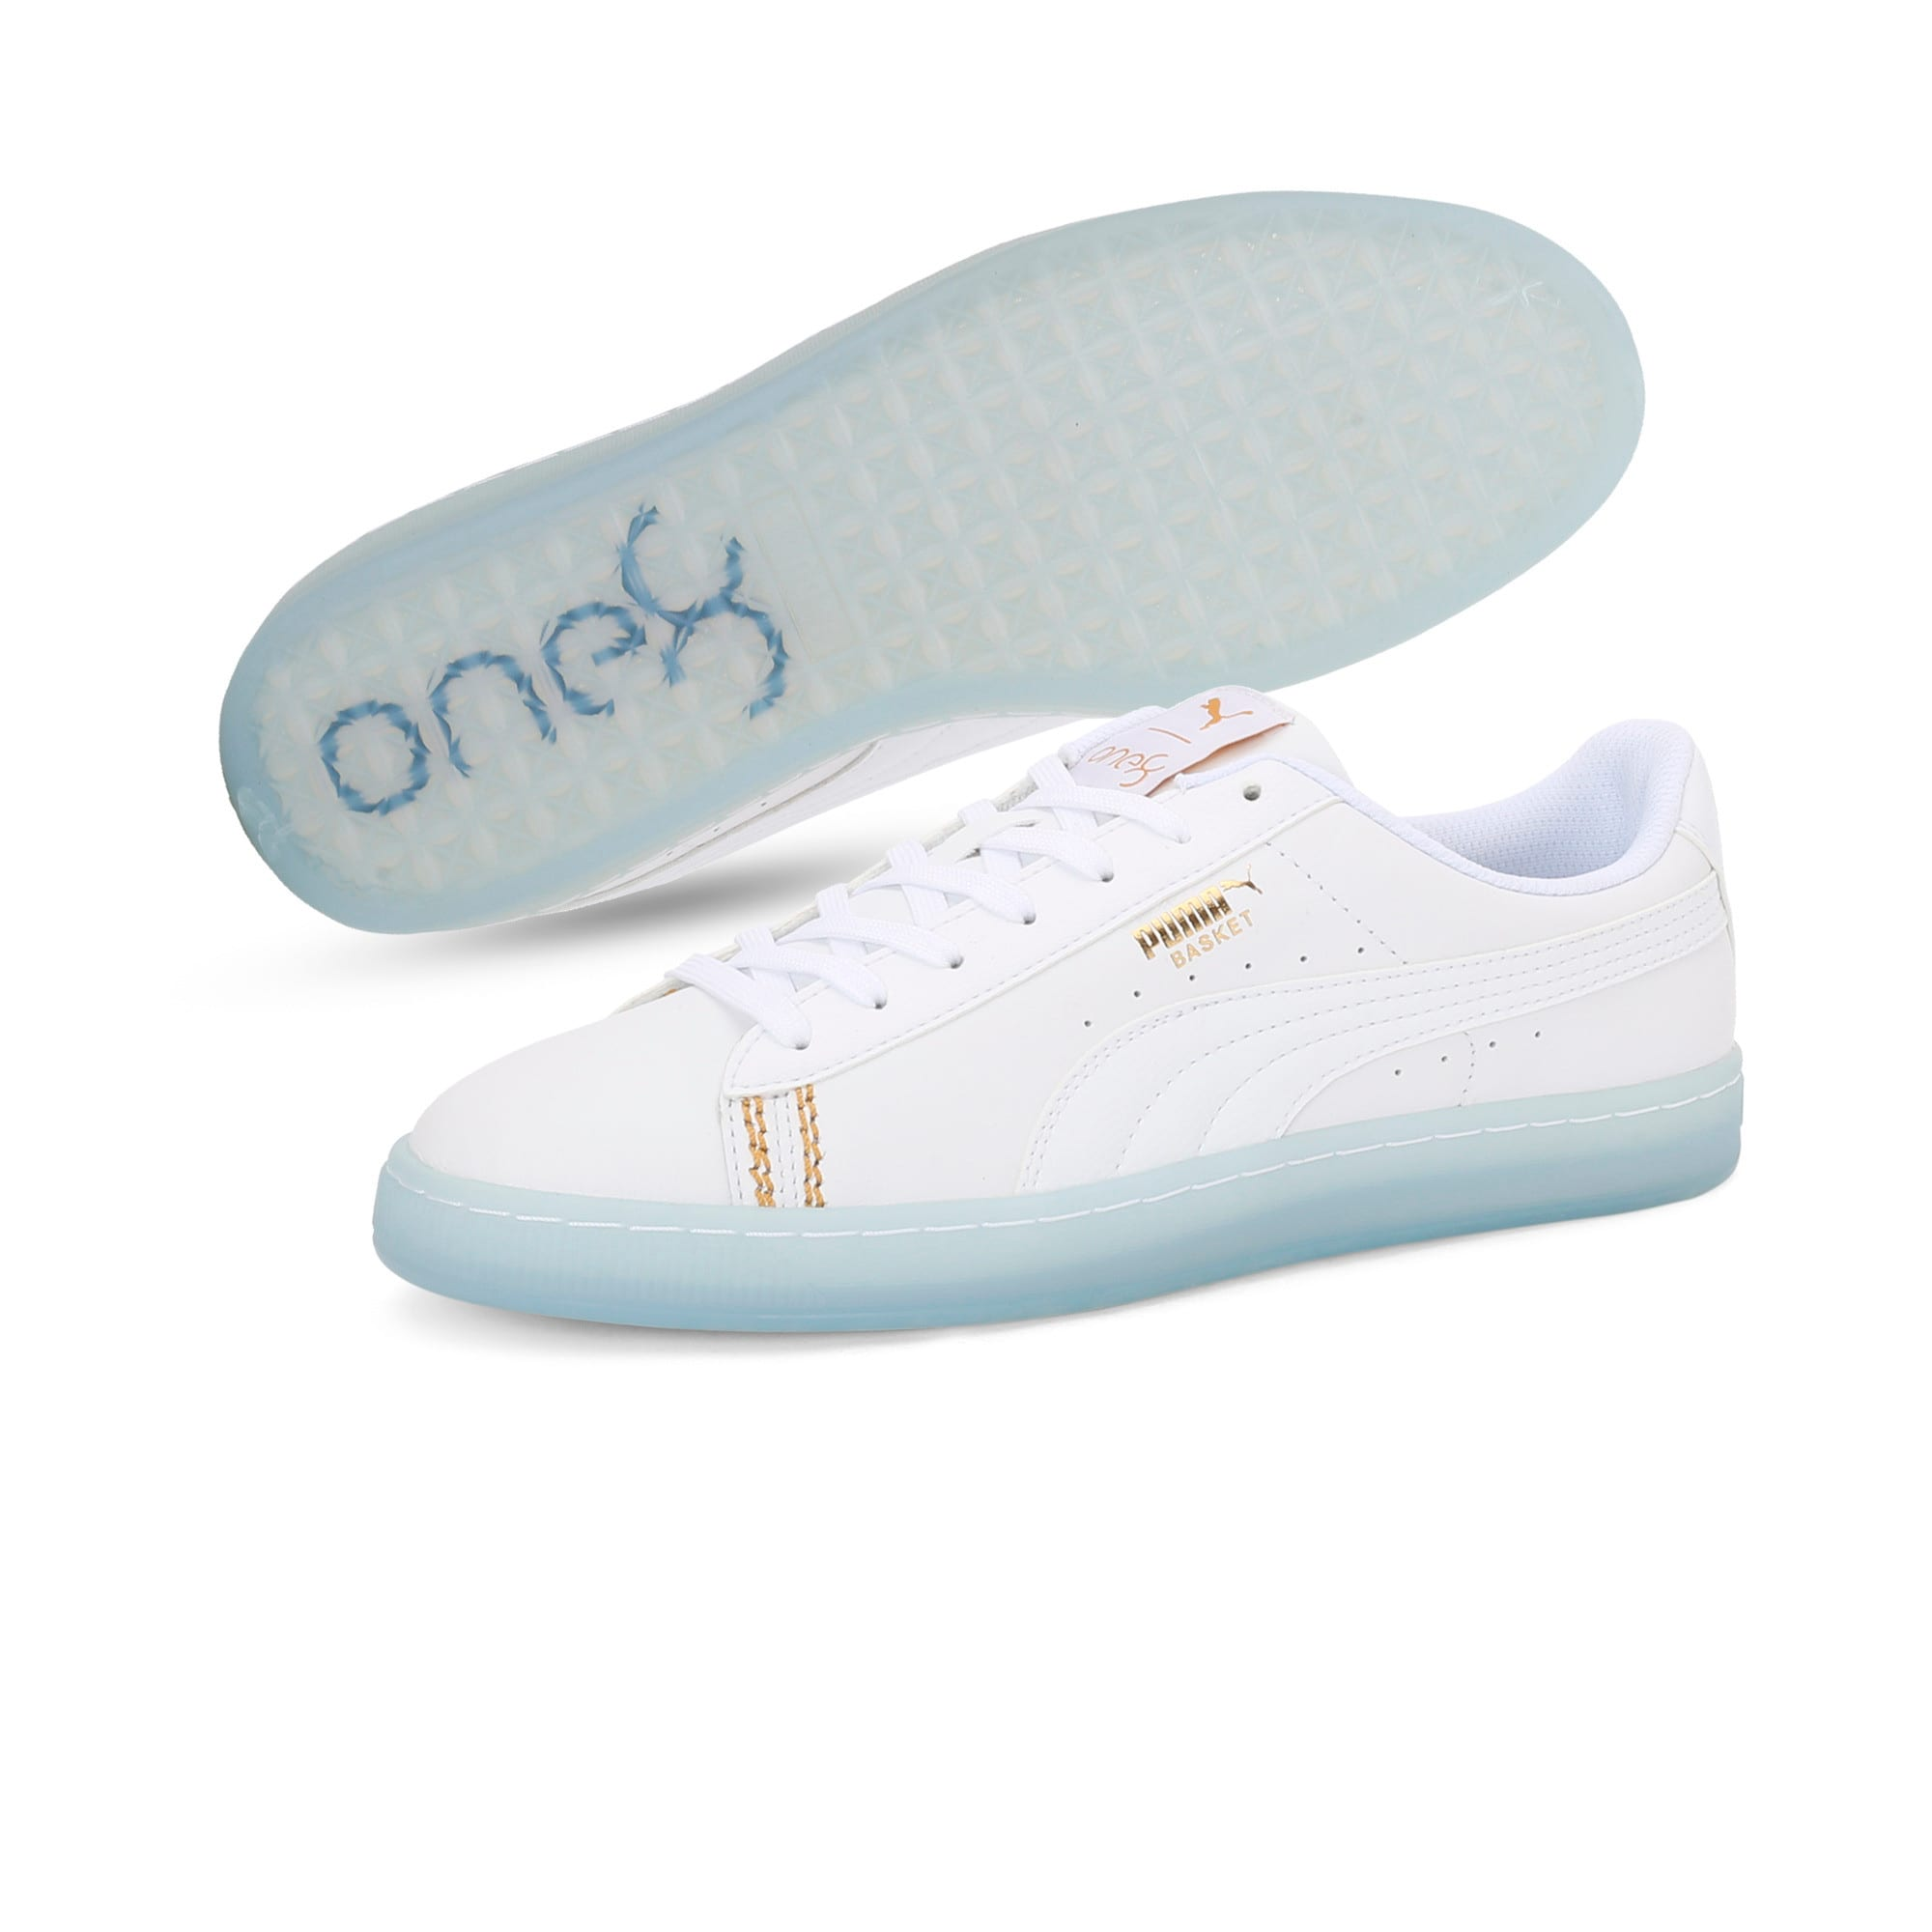 promo code 42e84 c5864 Basket Classic Reptile one8 Unisex Sneakers